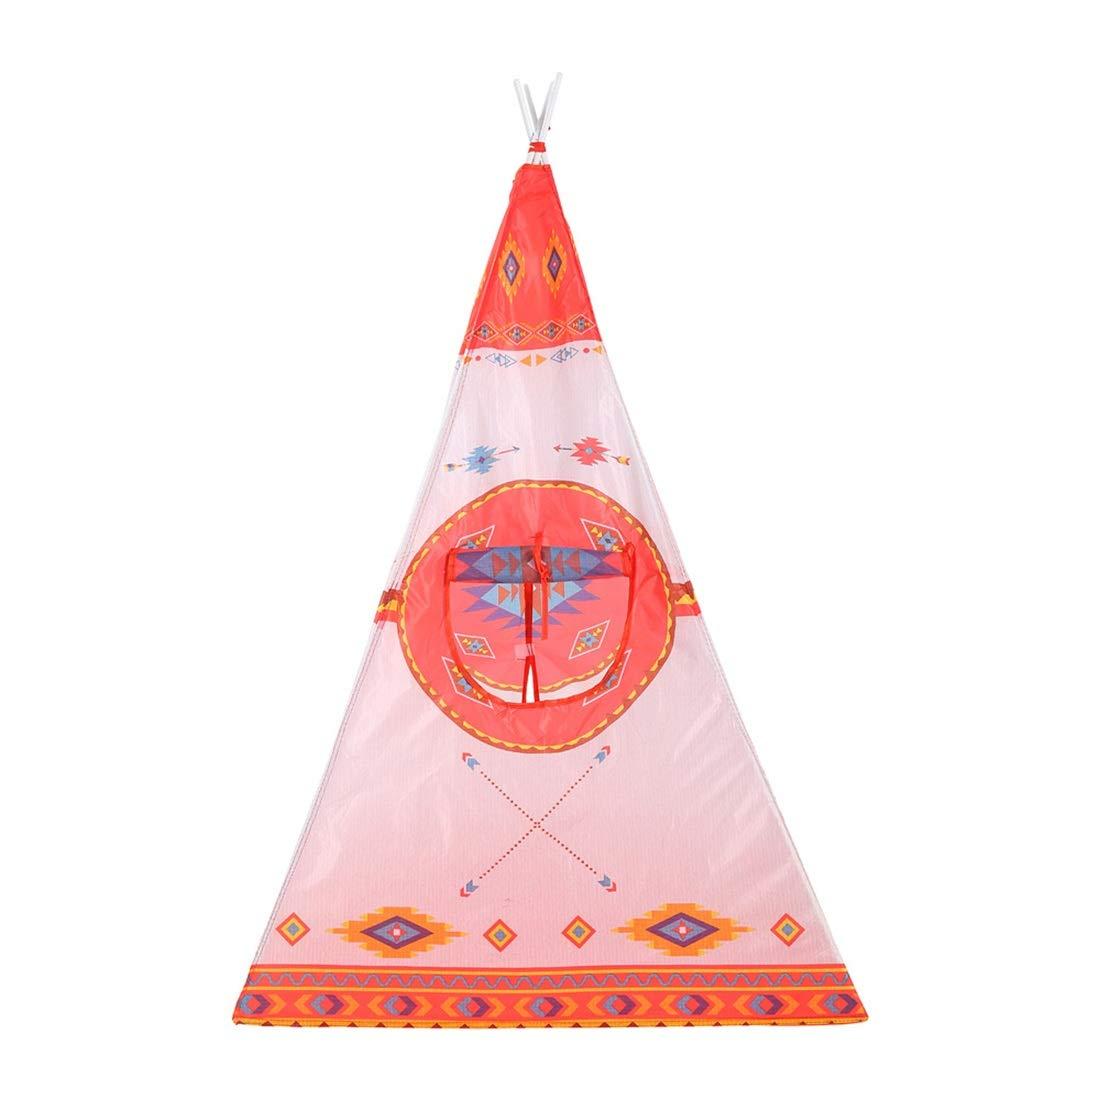 Xasclnis Kinderspielzelt Ethnic Style Amerika Europa und Amerika Style Baby Spielzeug Jurte Prinzessin Moskitonetz Game House (Größe   One Größe) 31bbf6